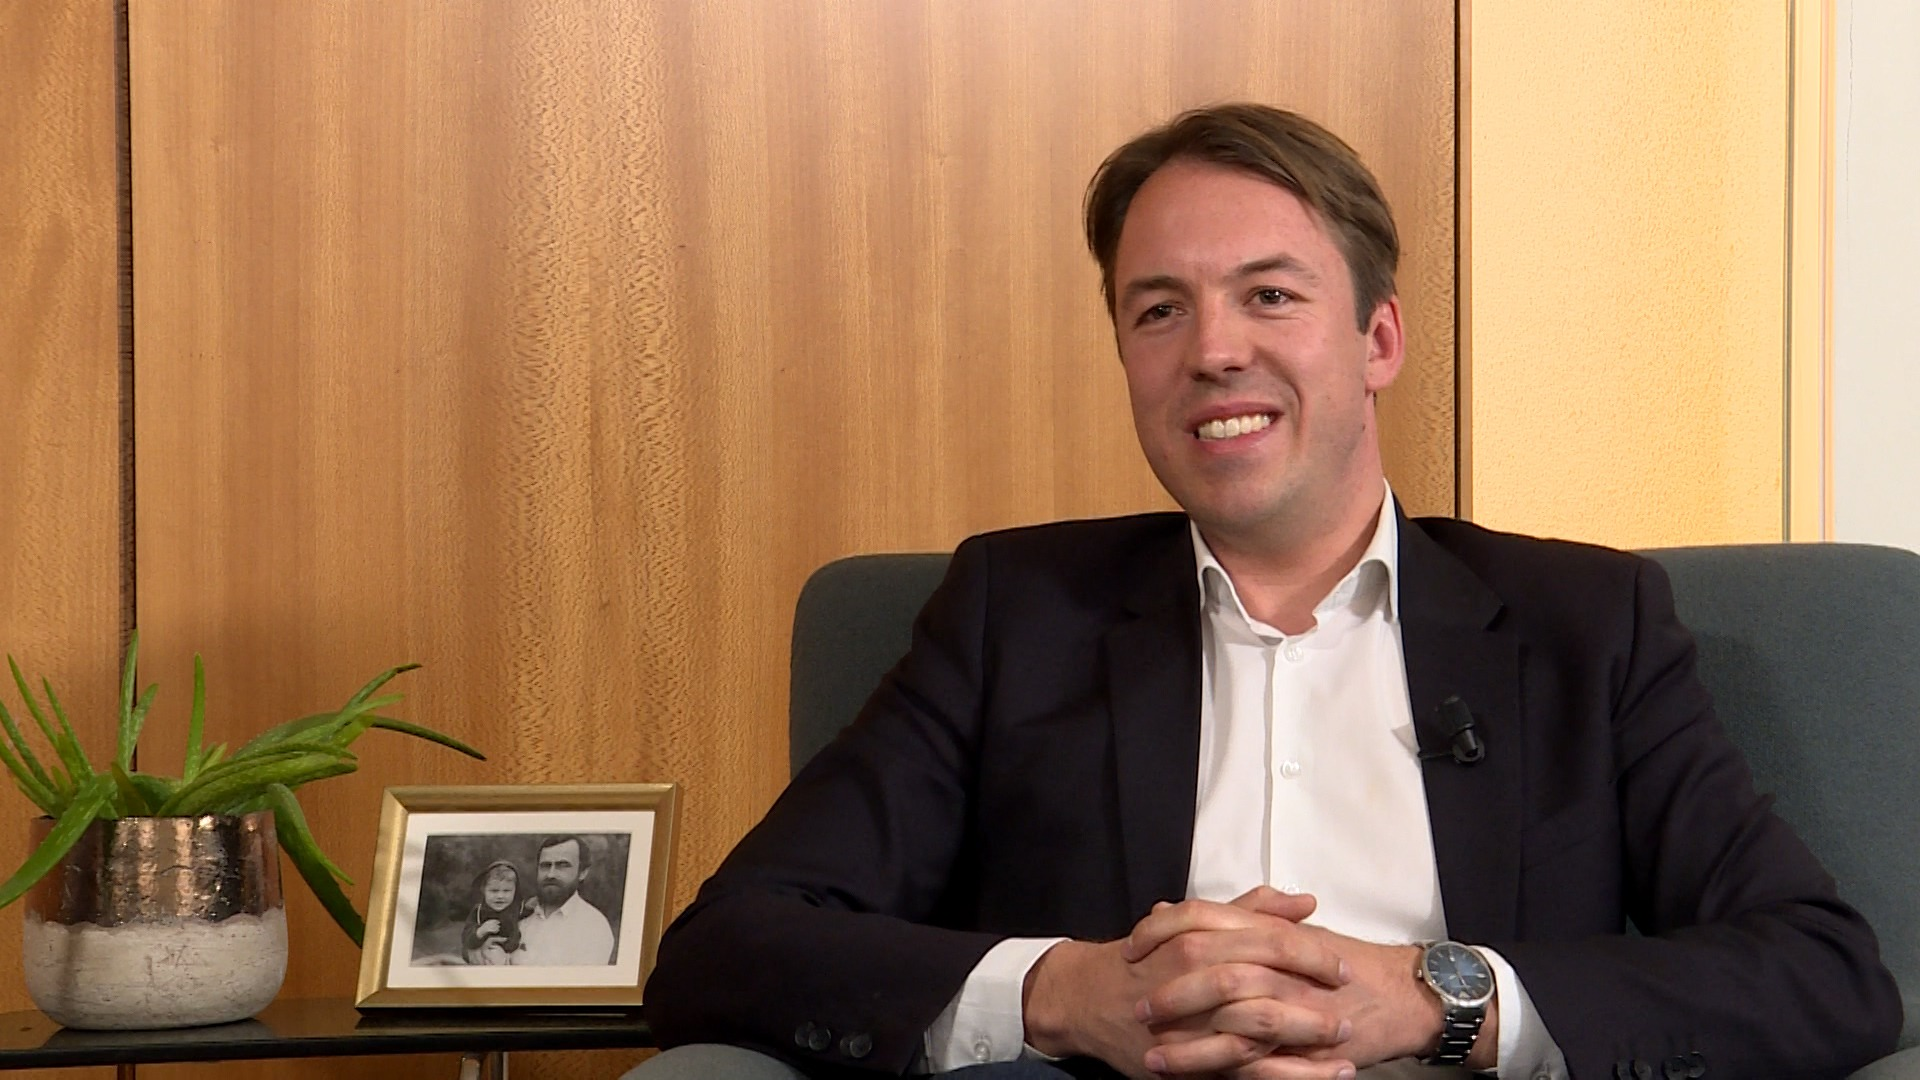 100 kandidaten: Sam van Rooy (Vlaams Belang)